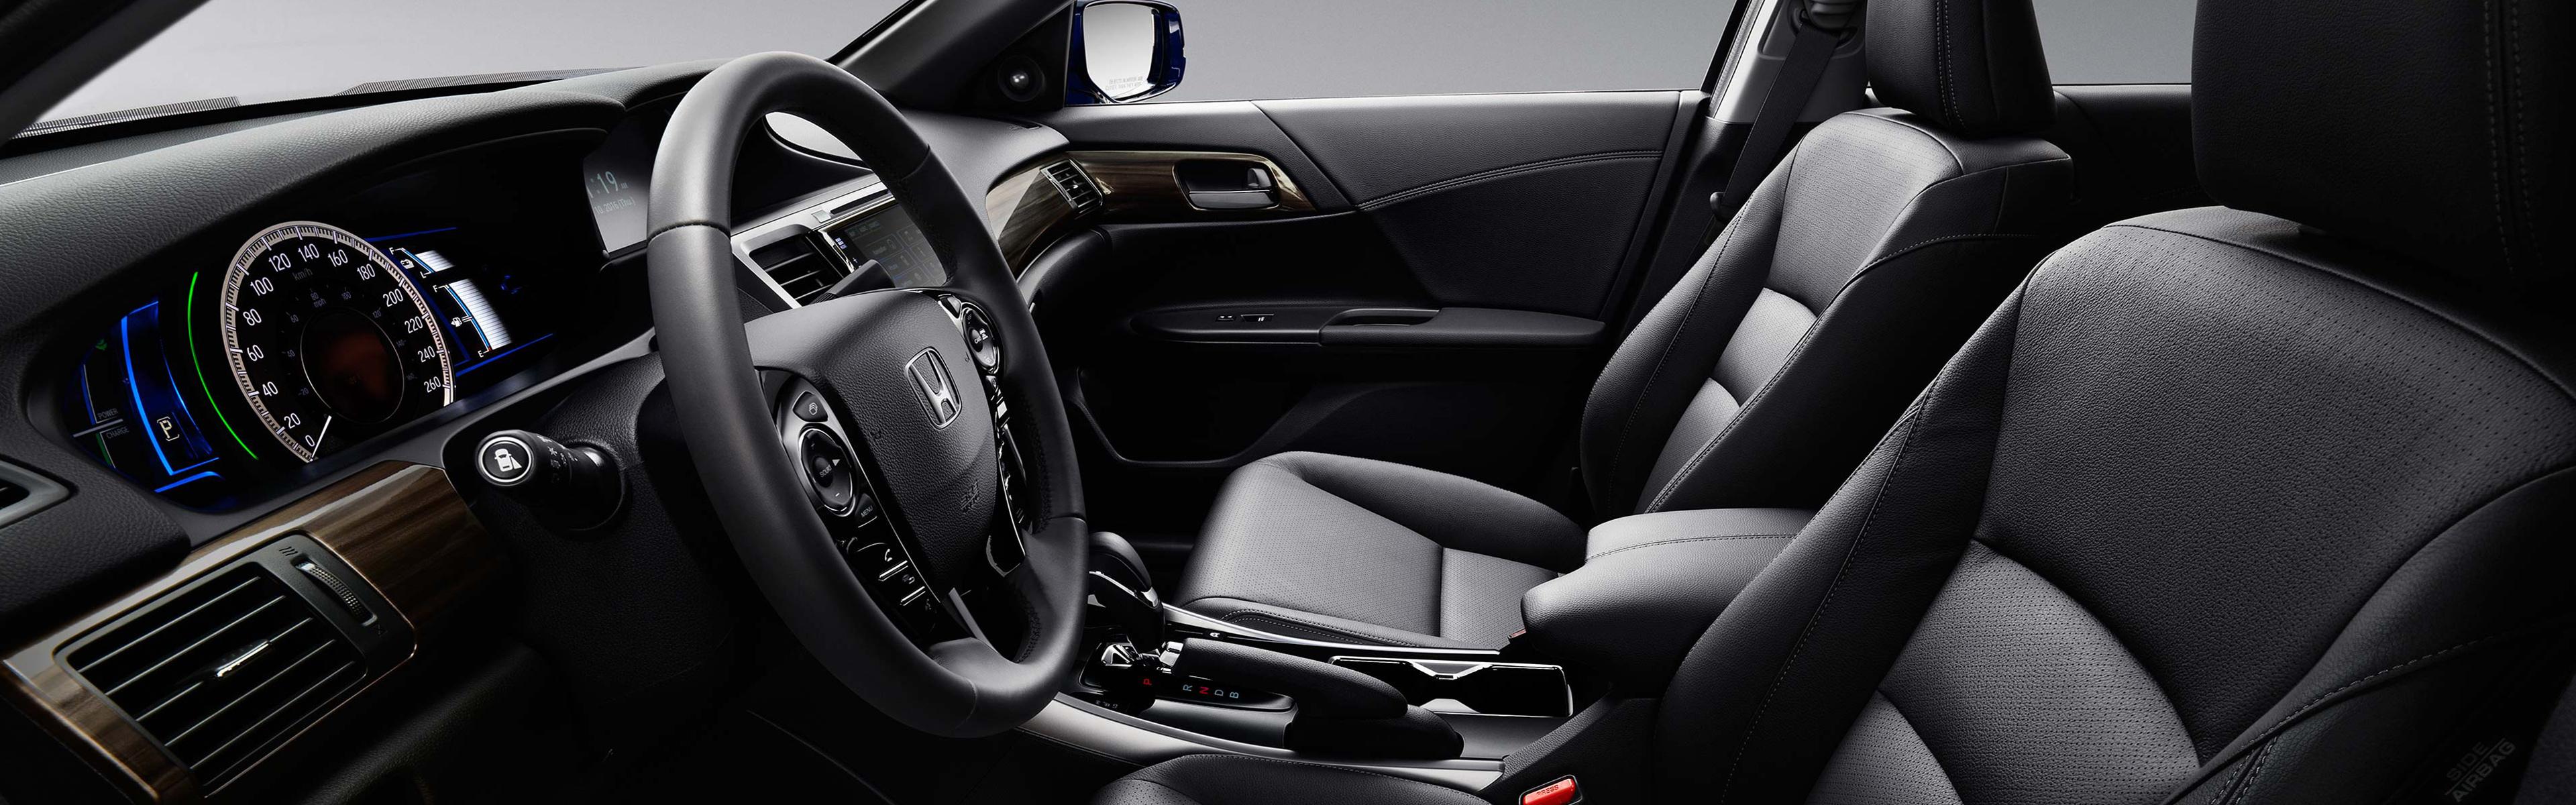 interior-hybrid